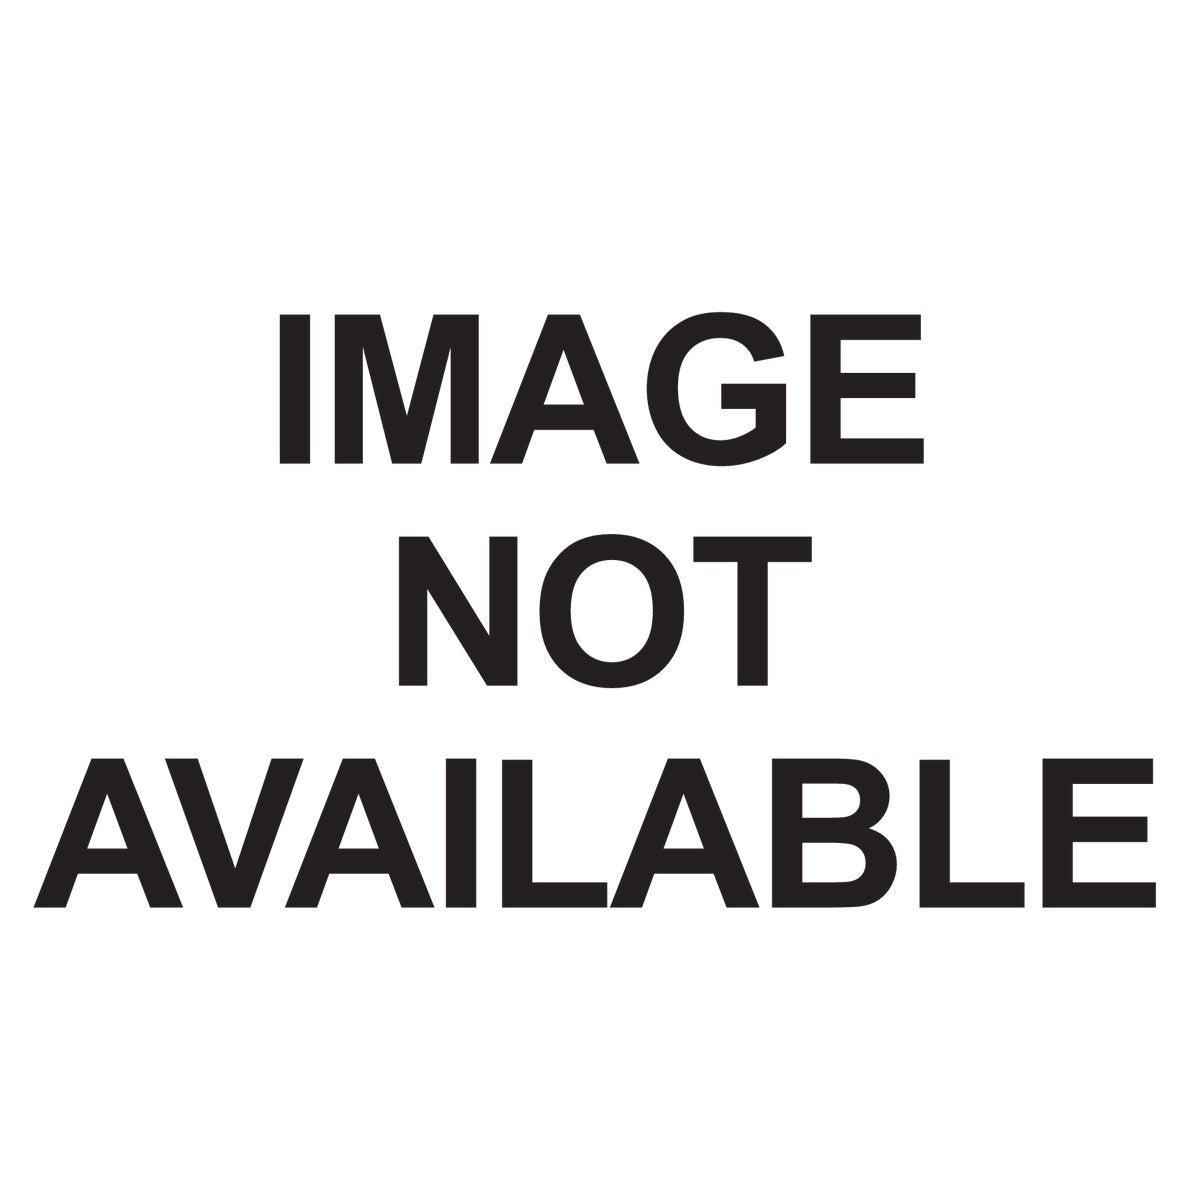 2T ARBSQ ARBRS WALLPLATE - 9DCA102 by Jackson Deerfield Mf